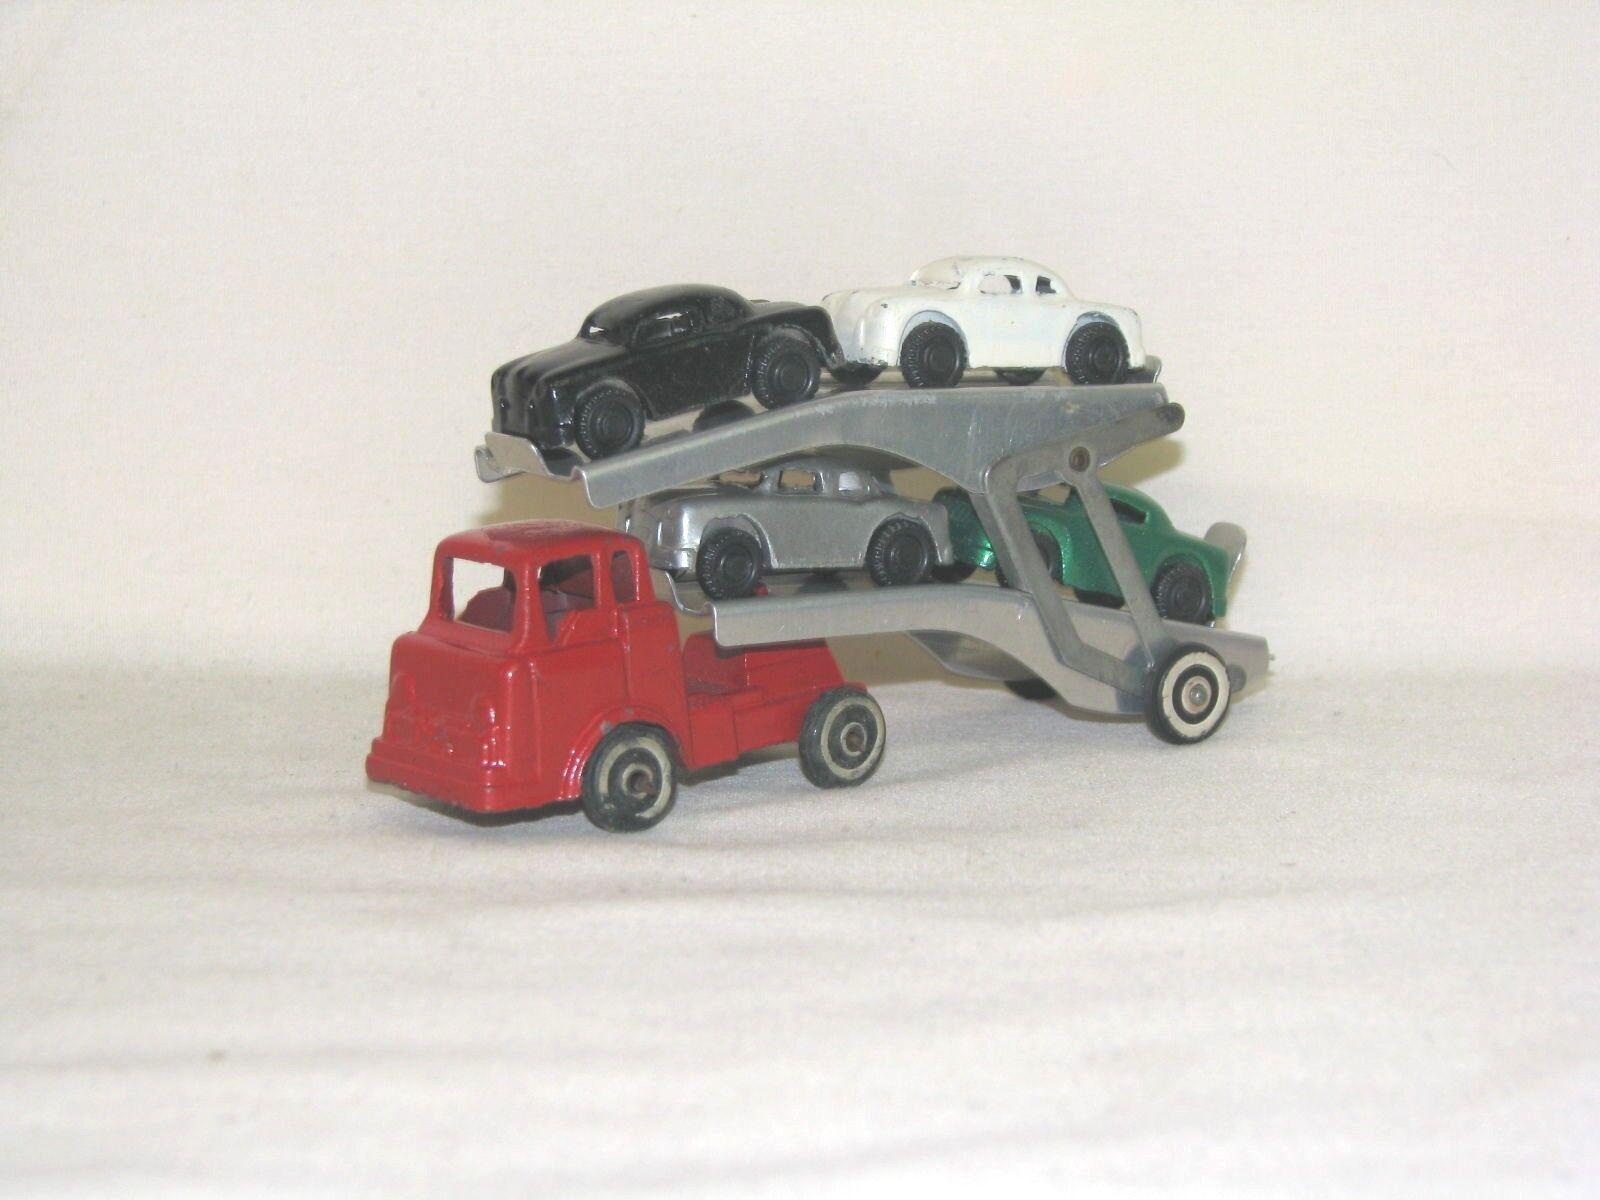 2 VINTAGE BARCLAY TRANSPORT CAR HAULER W/bianca  WALL TIRES, MODERN SERIES, SLUSH